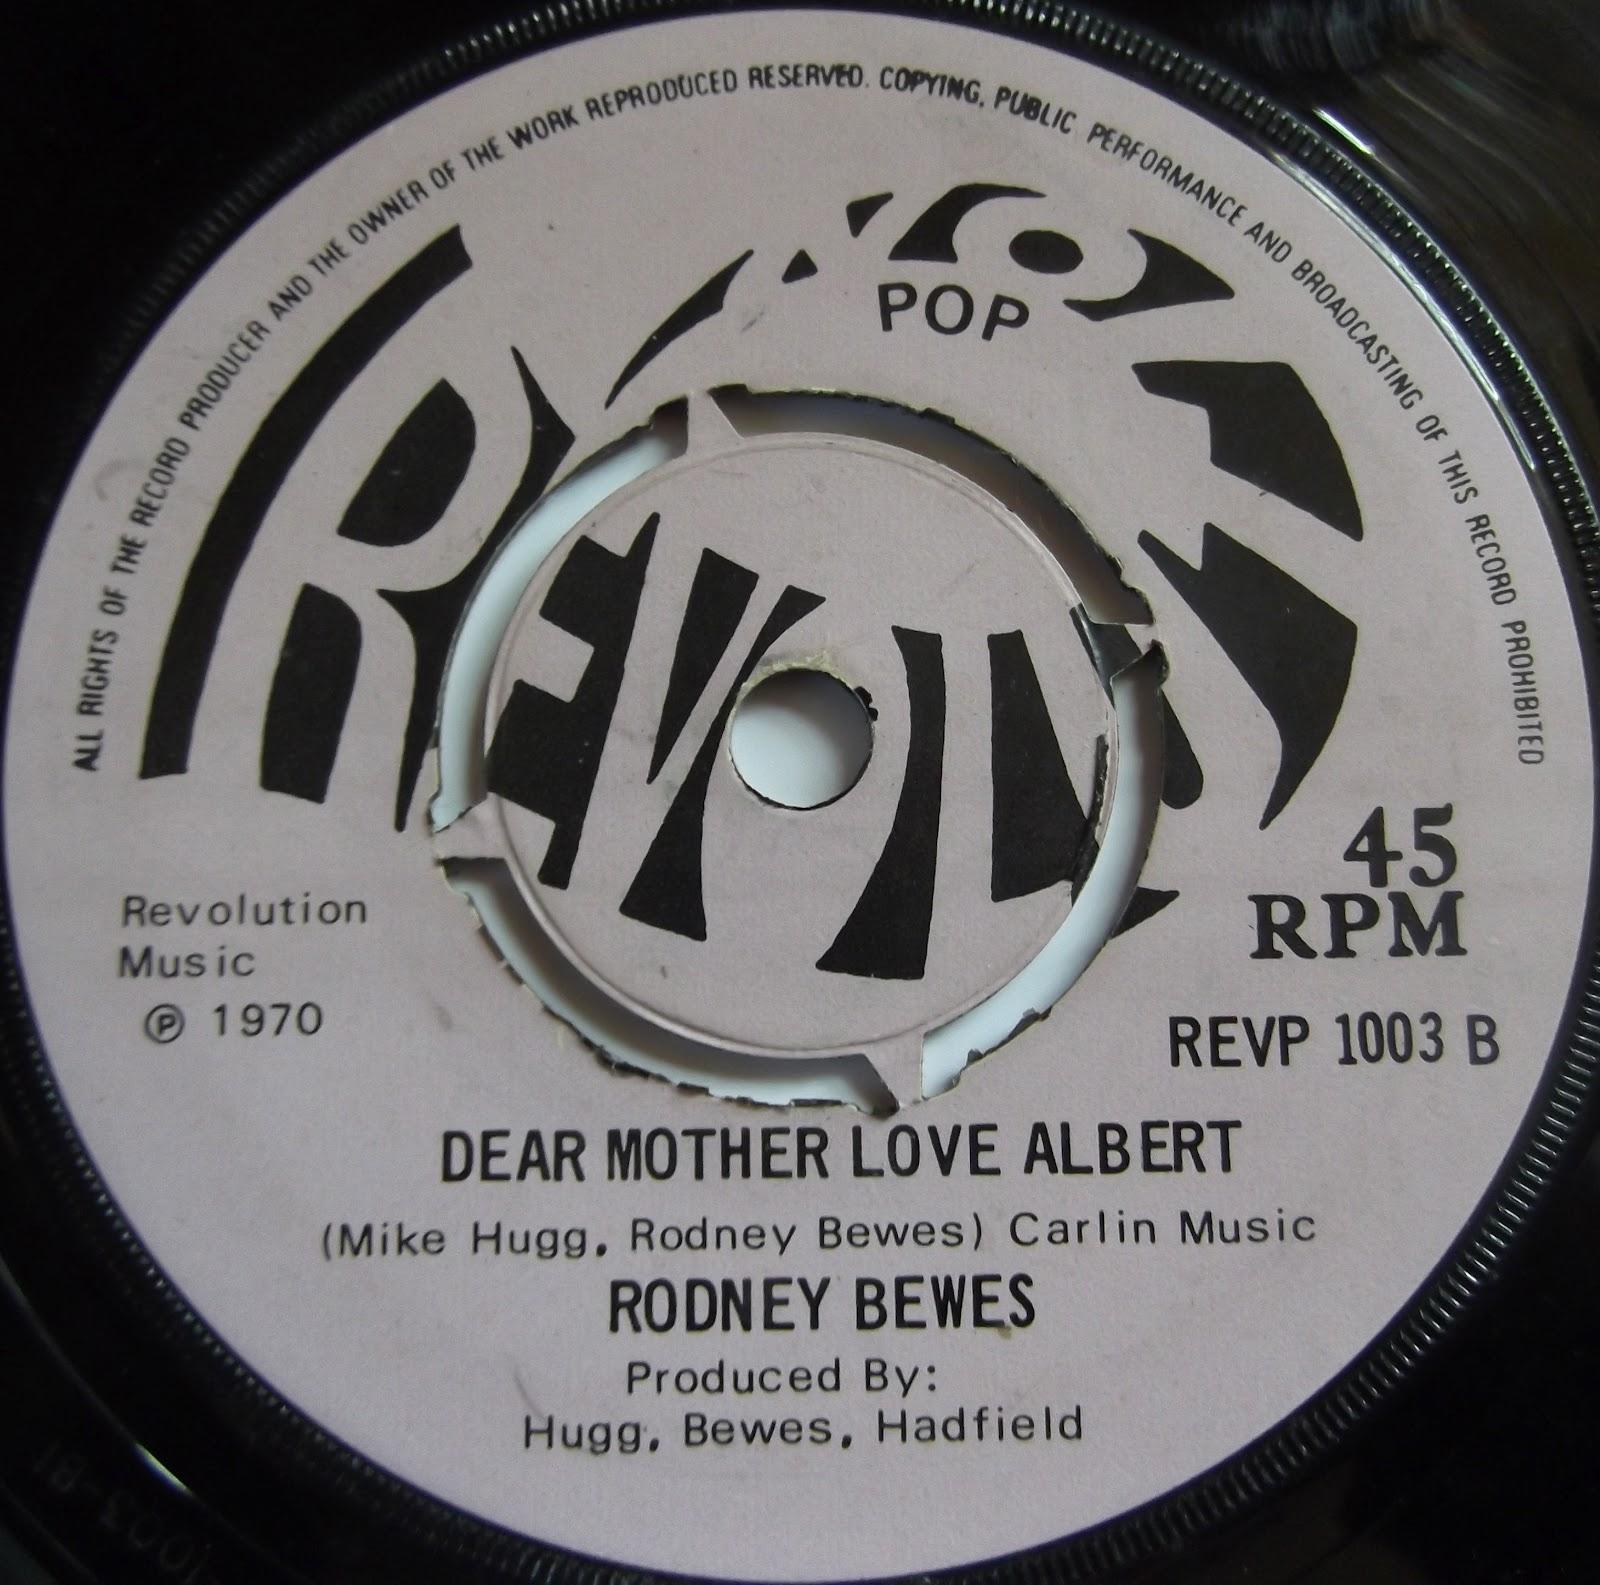 Rodney Bewes - Dear Mother Love Albert